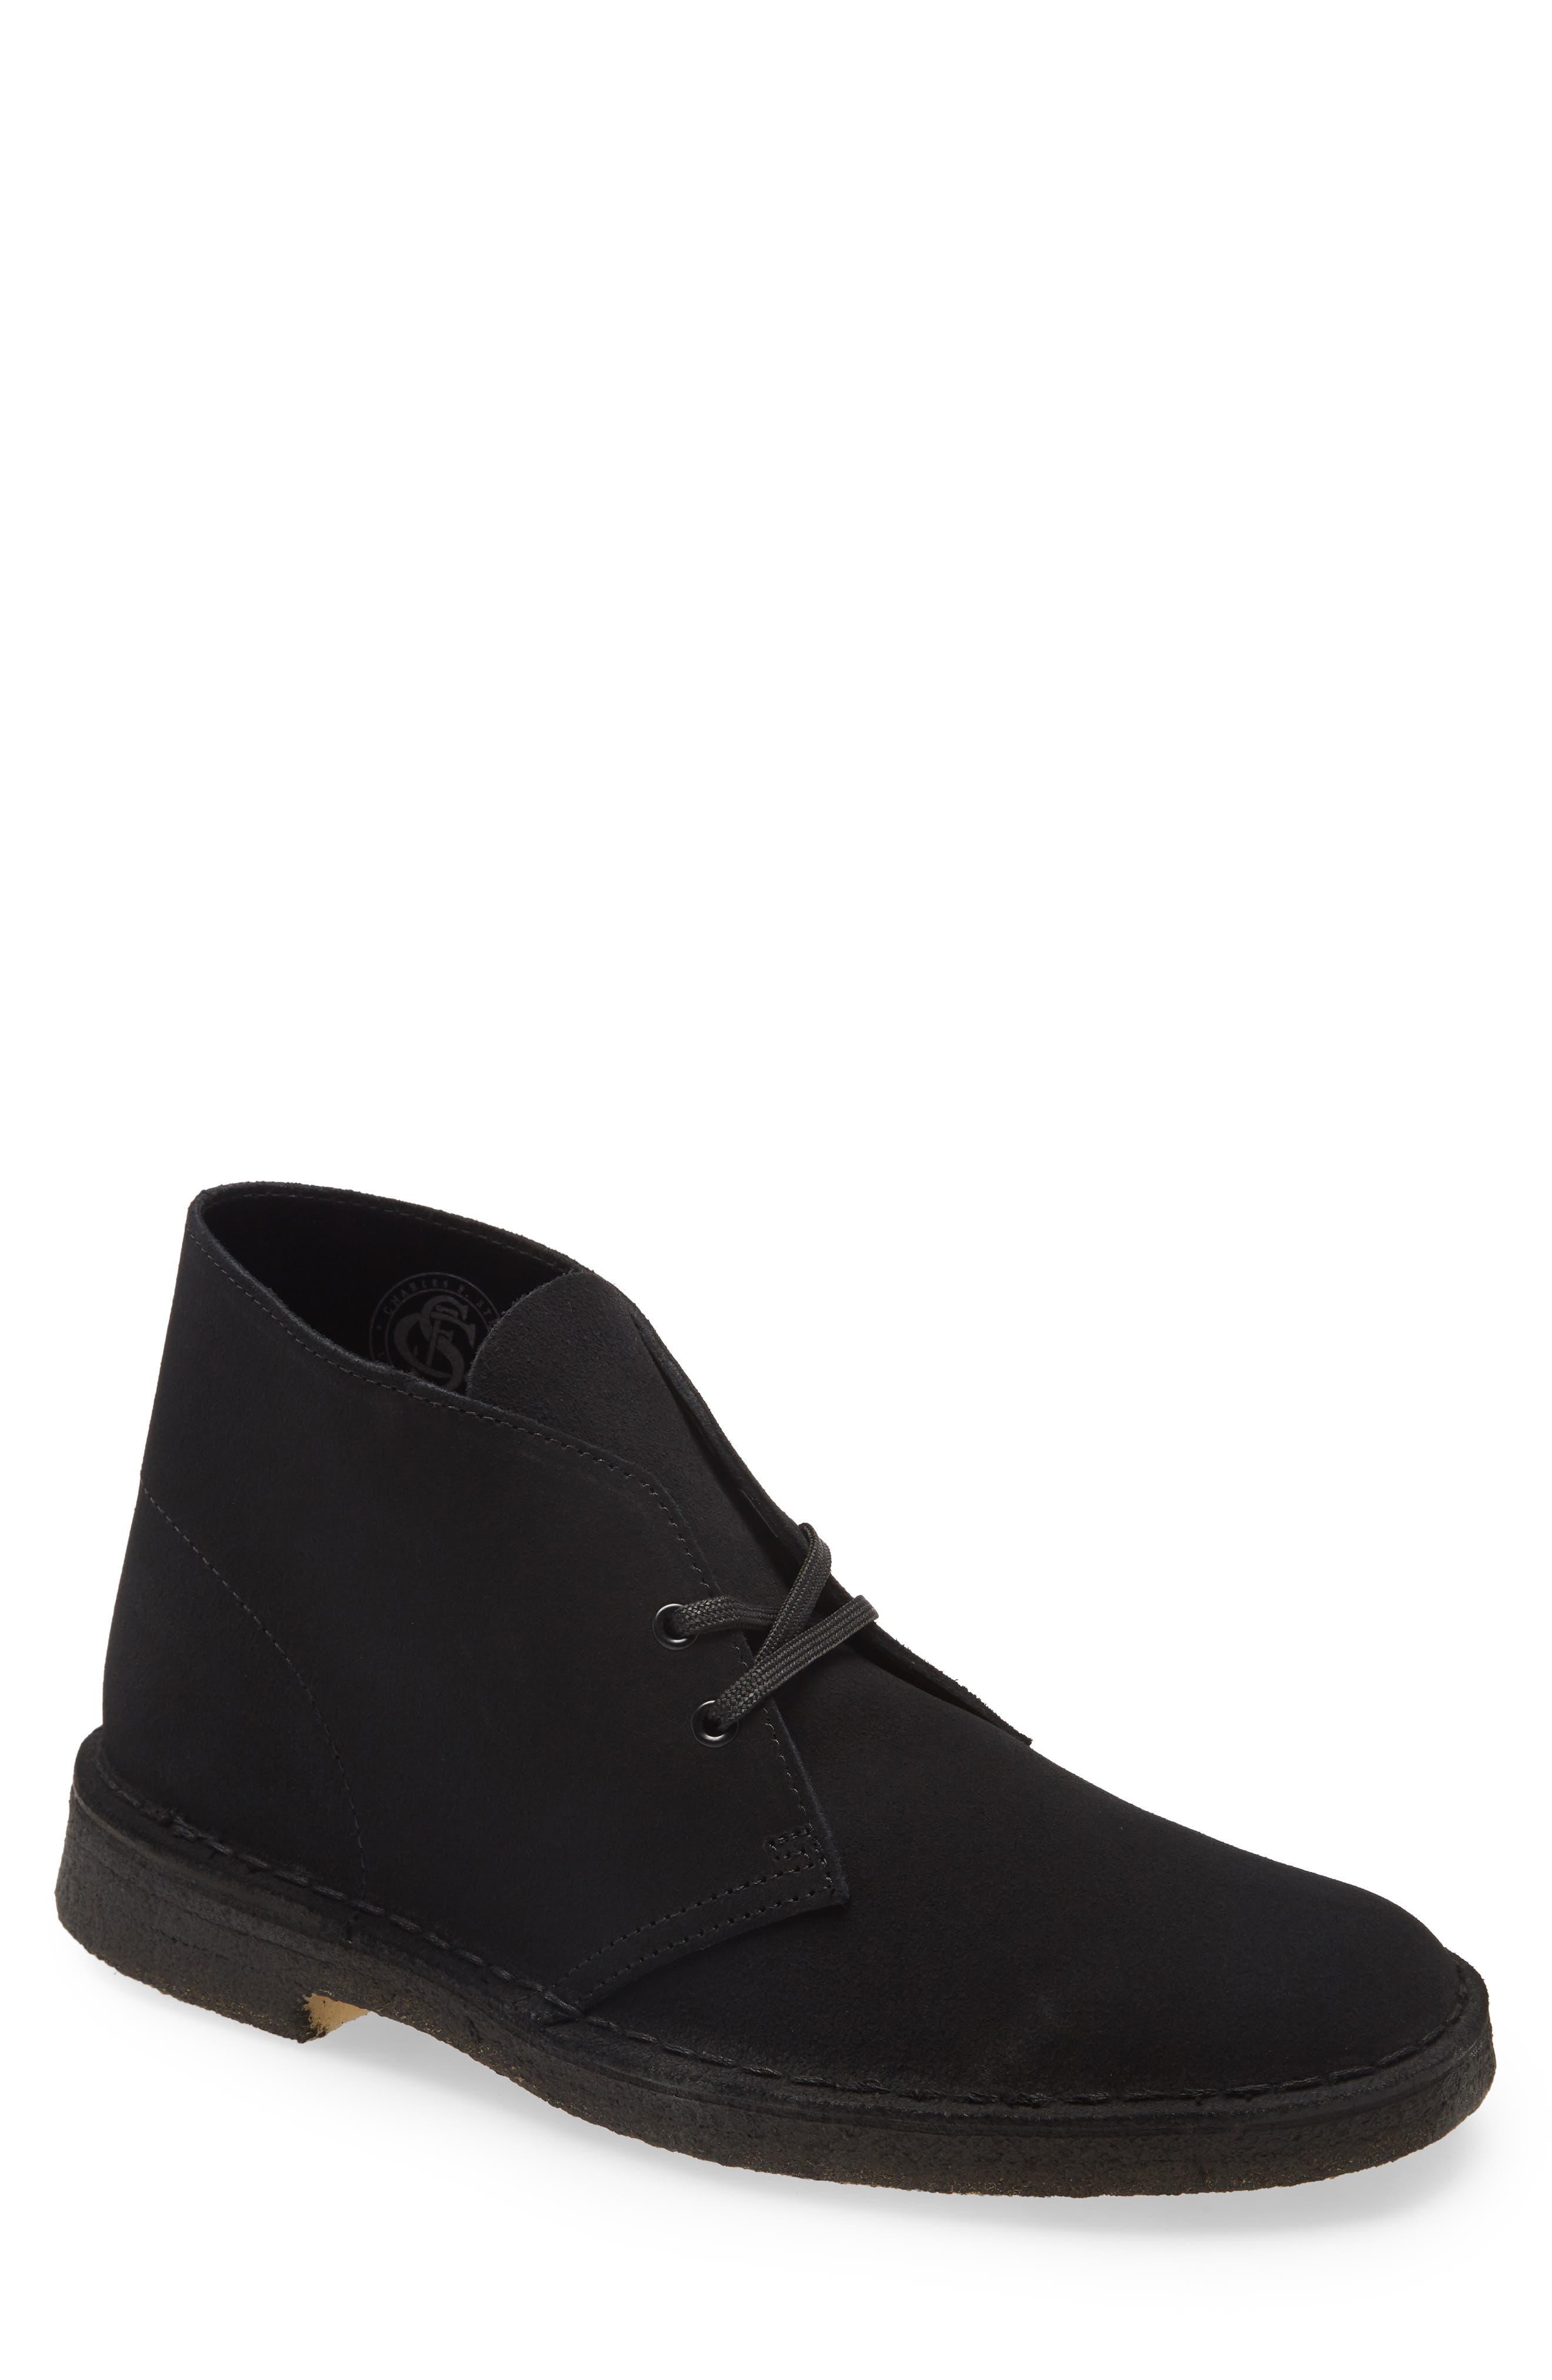 clarks men's desert boots sale